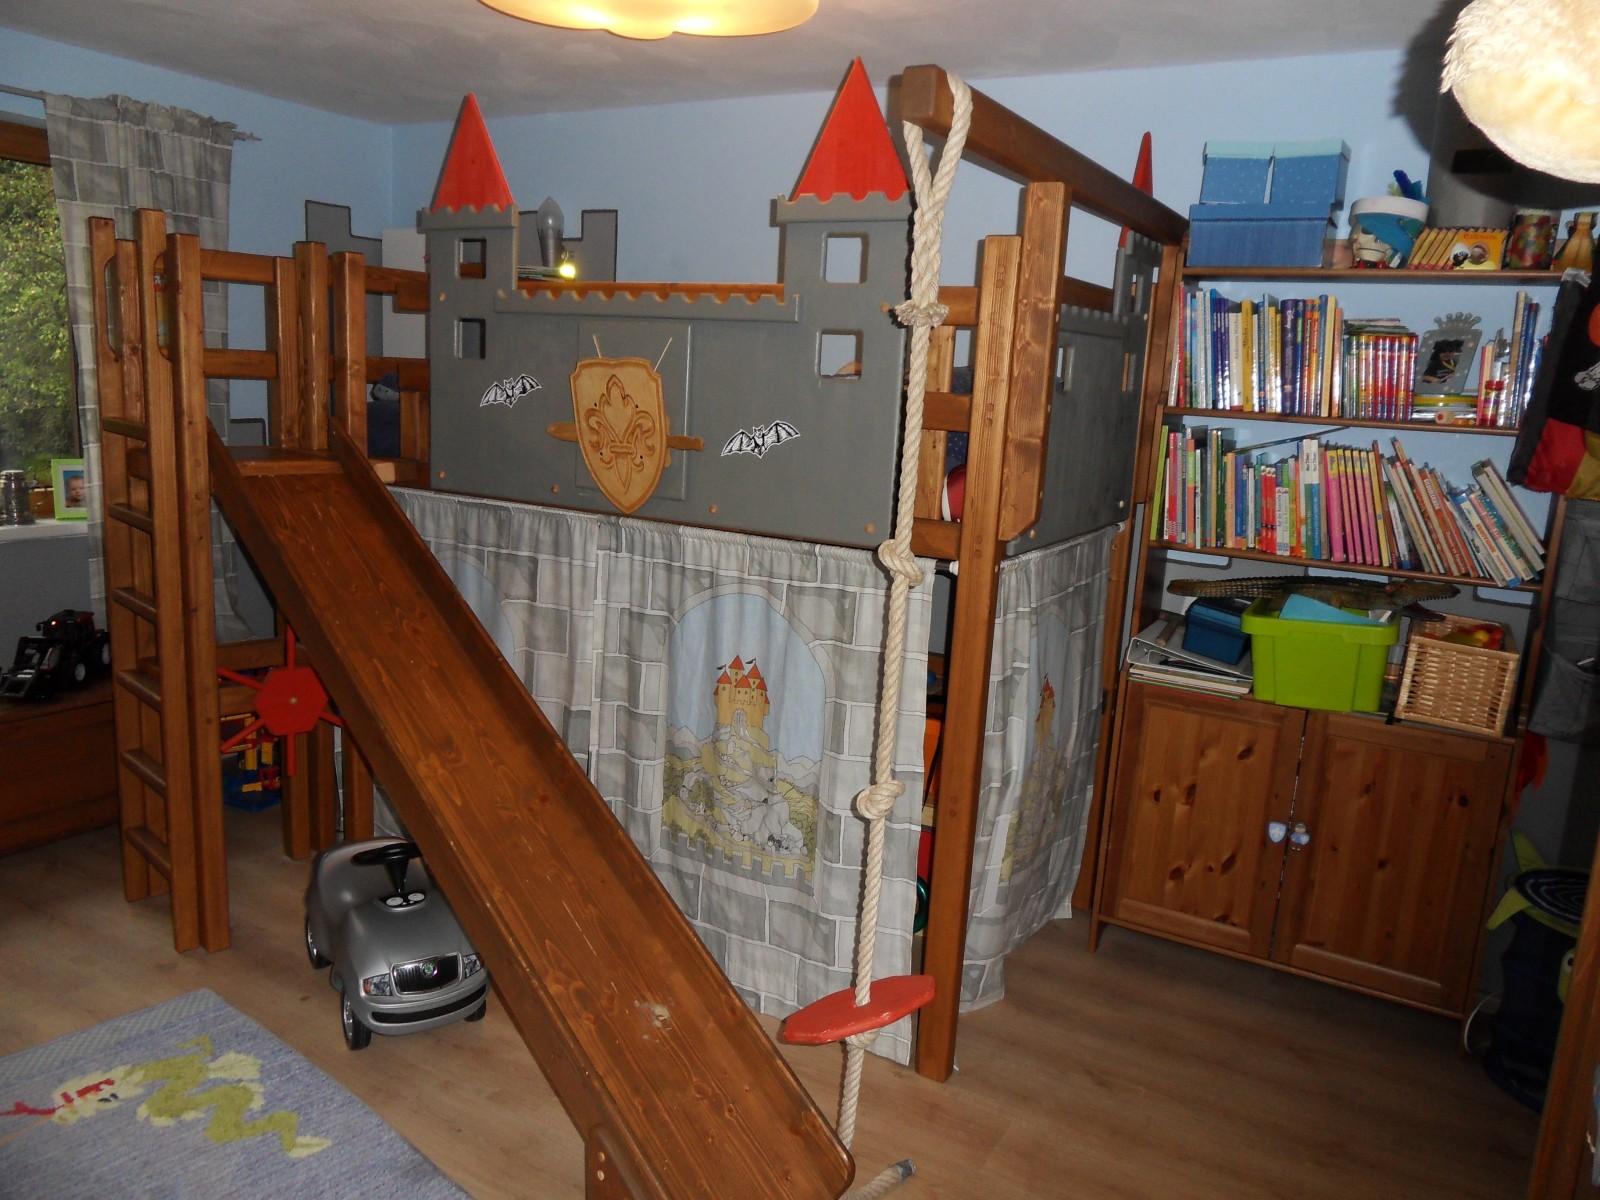 Kinderzimmer junge ritter  Kinderzimmer 'Kinderzimmer Ritter' - Unser Haus - Zimmerschau